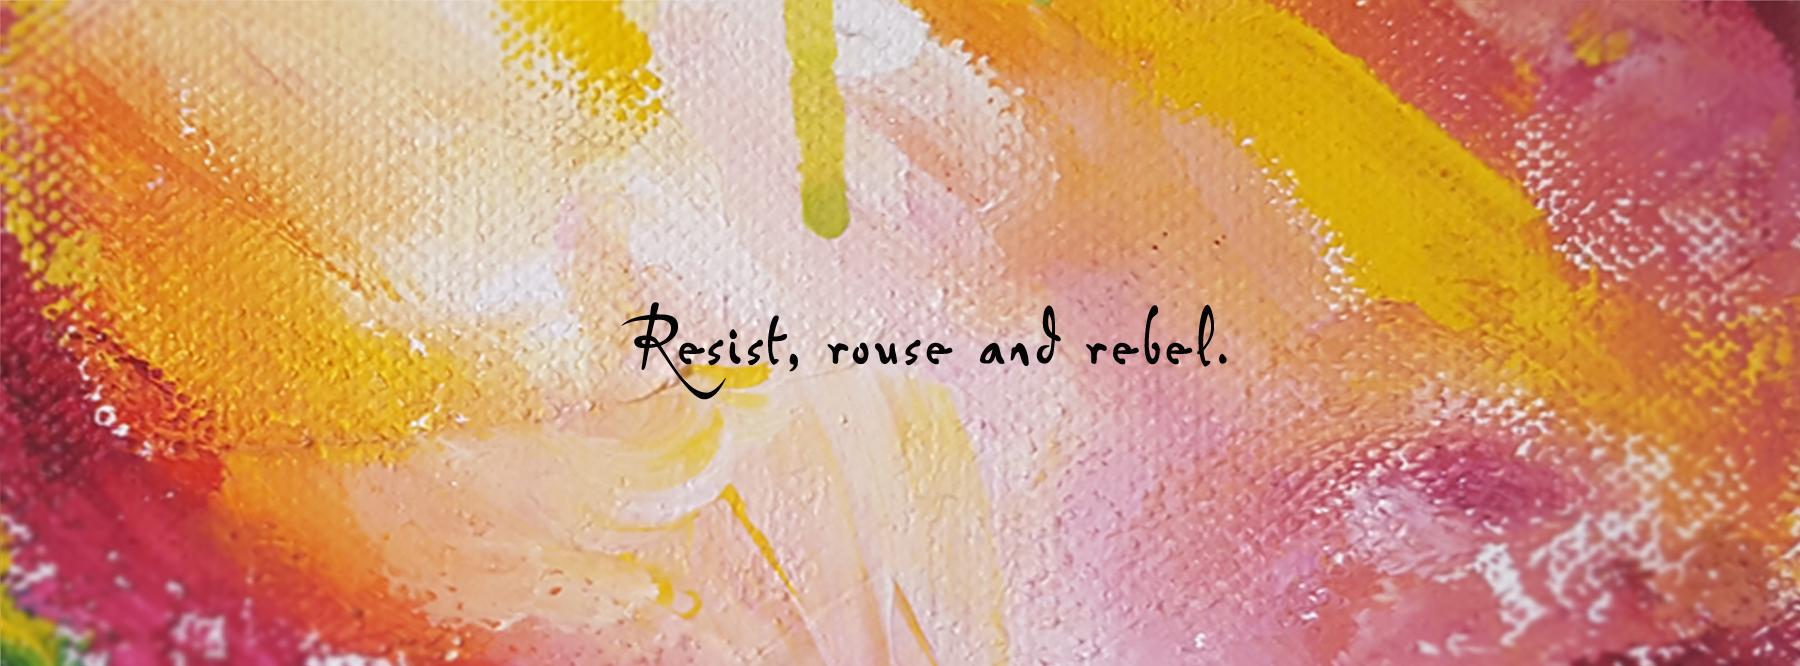 ResistRouseRebellrge